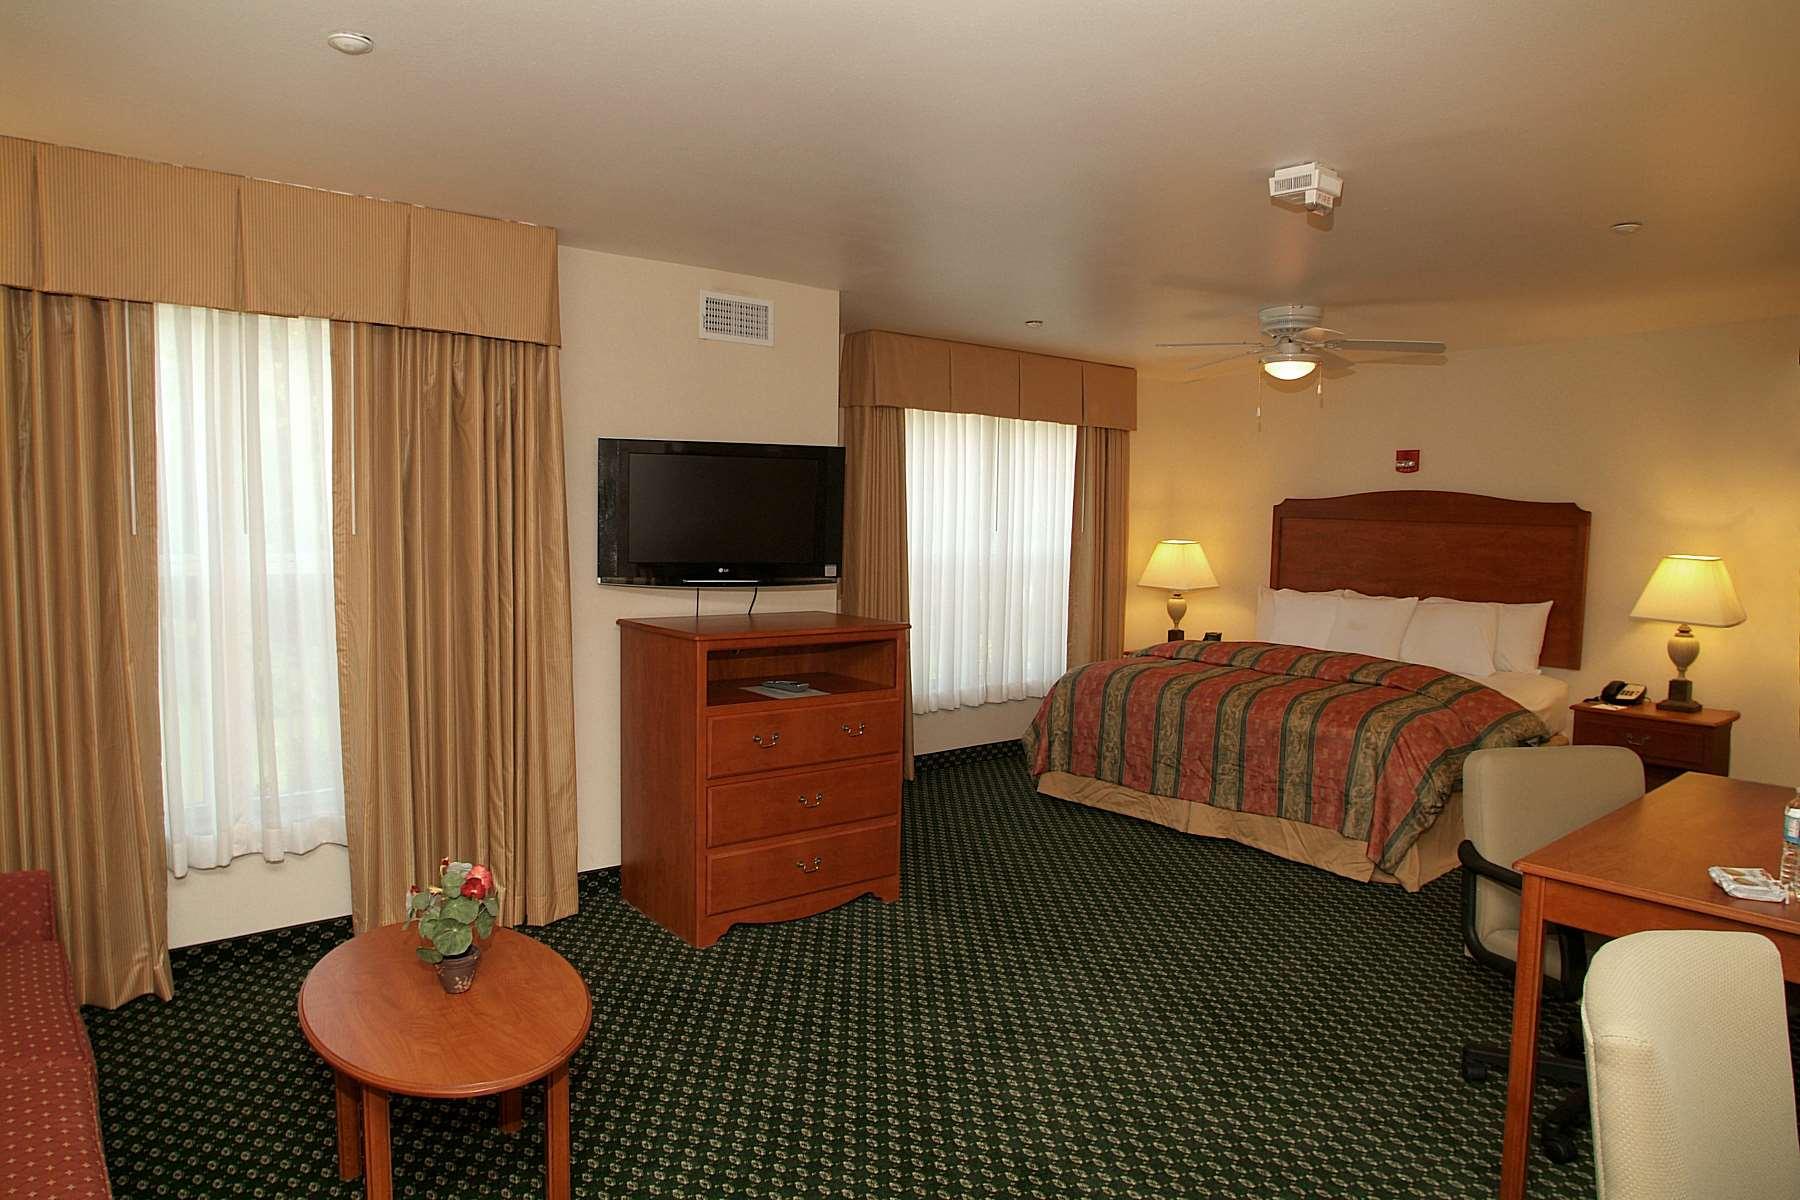 Homewood Suites by Hilton Philadelphia/Mt. Laurel image 4